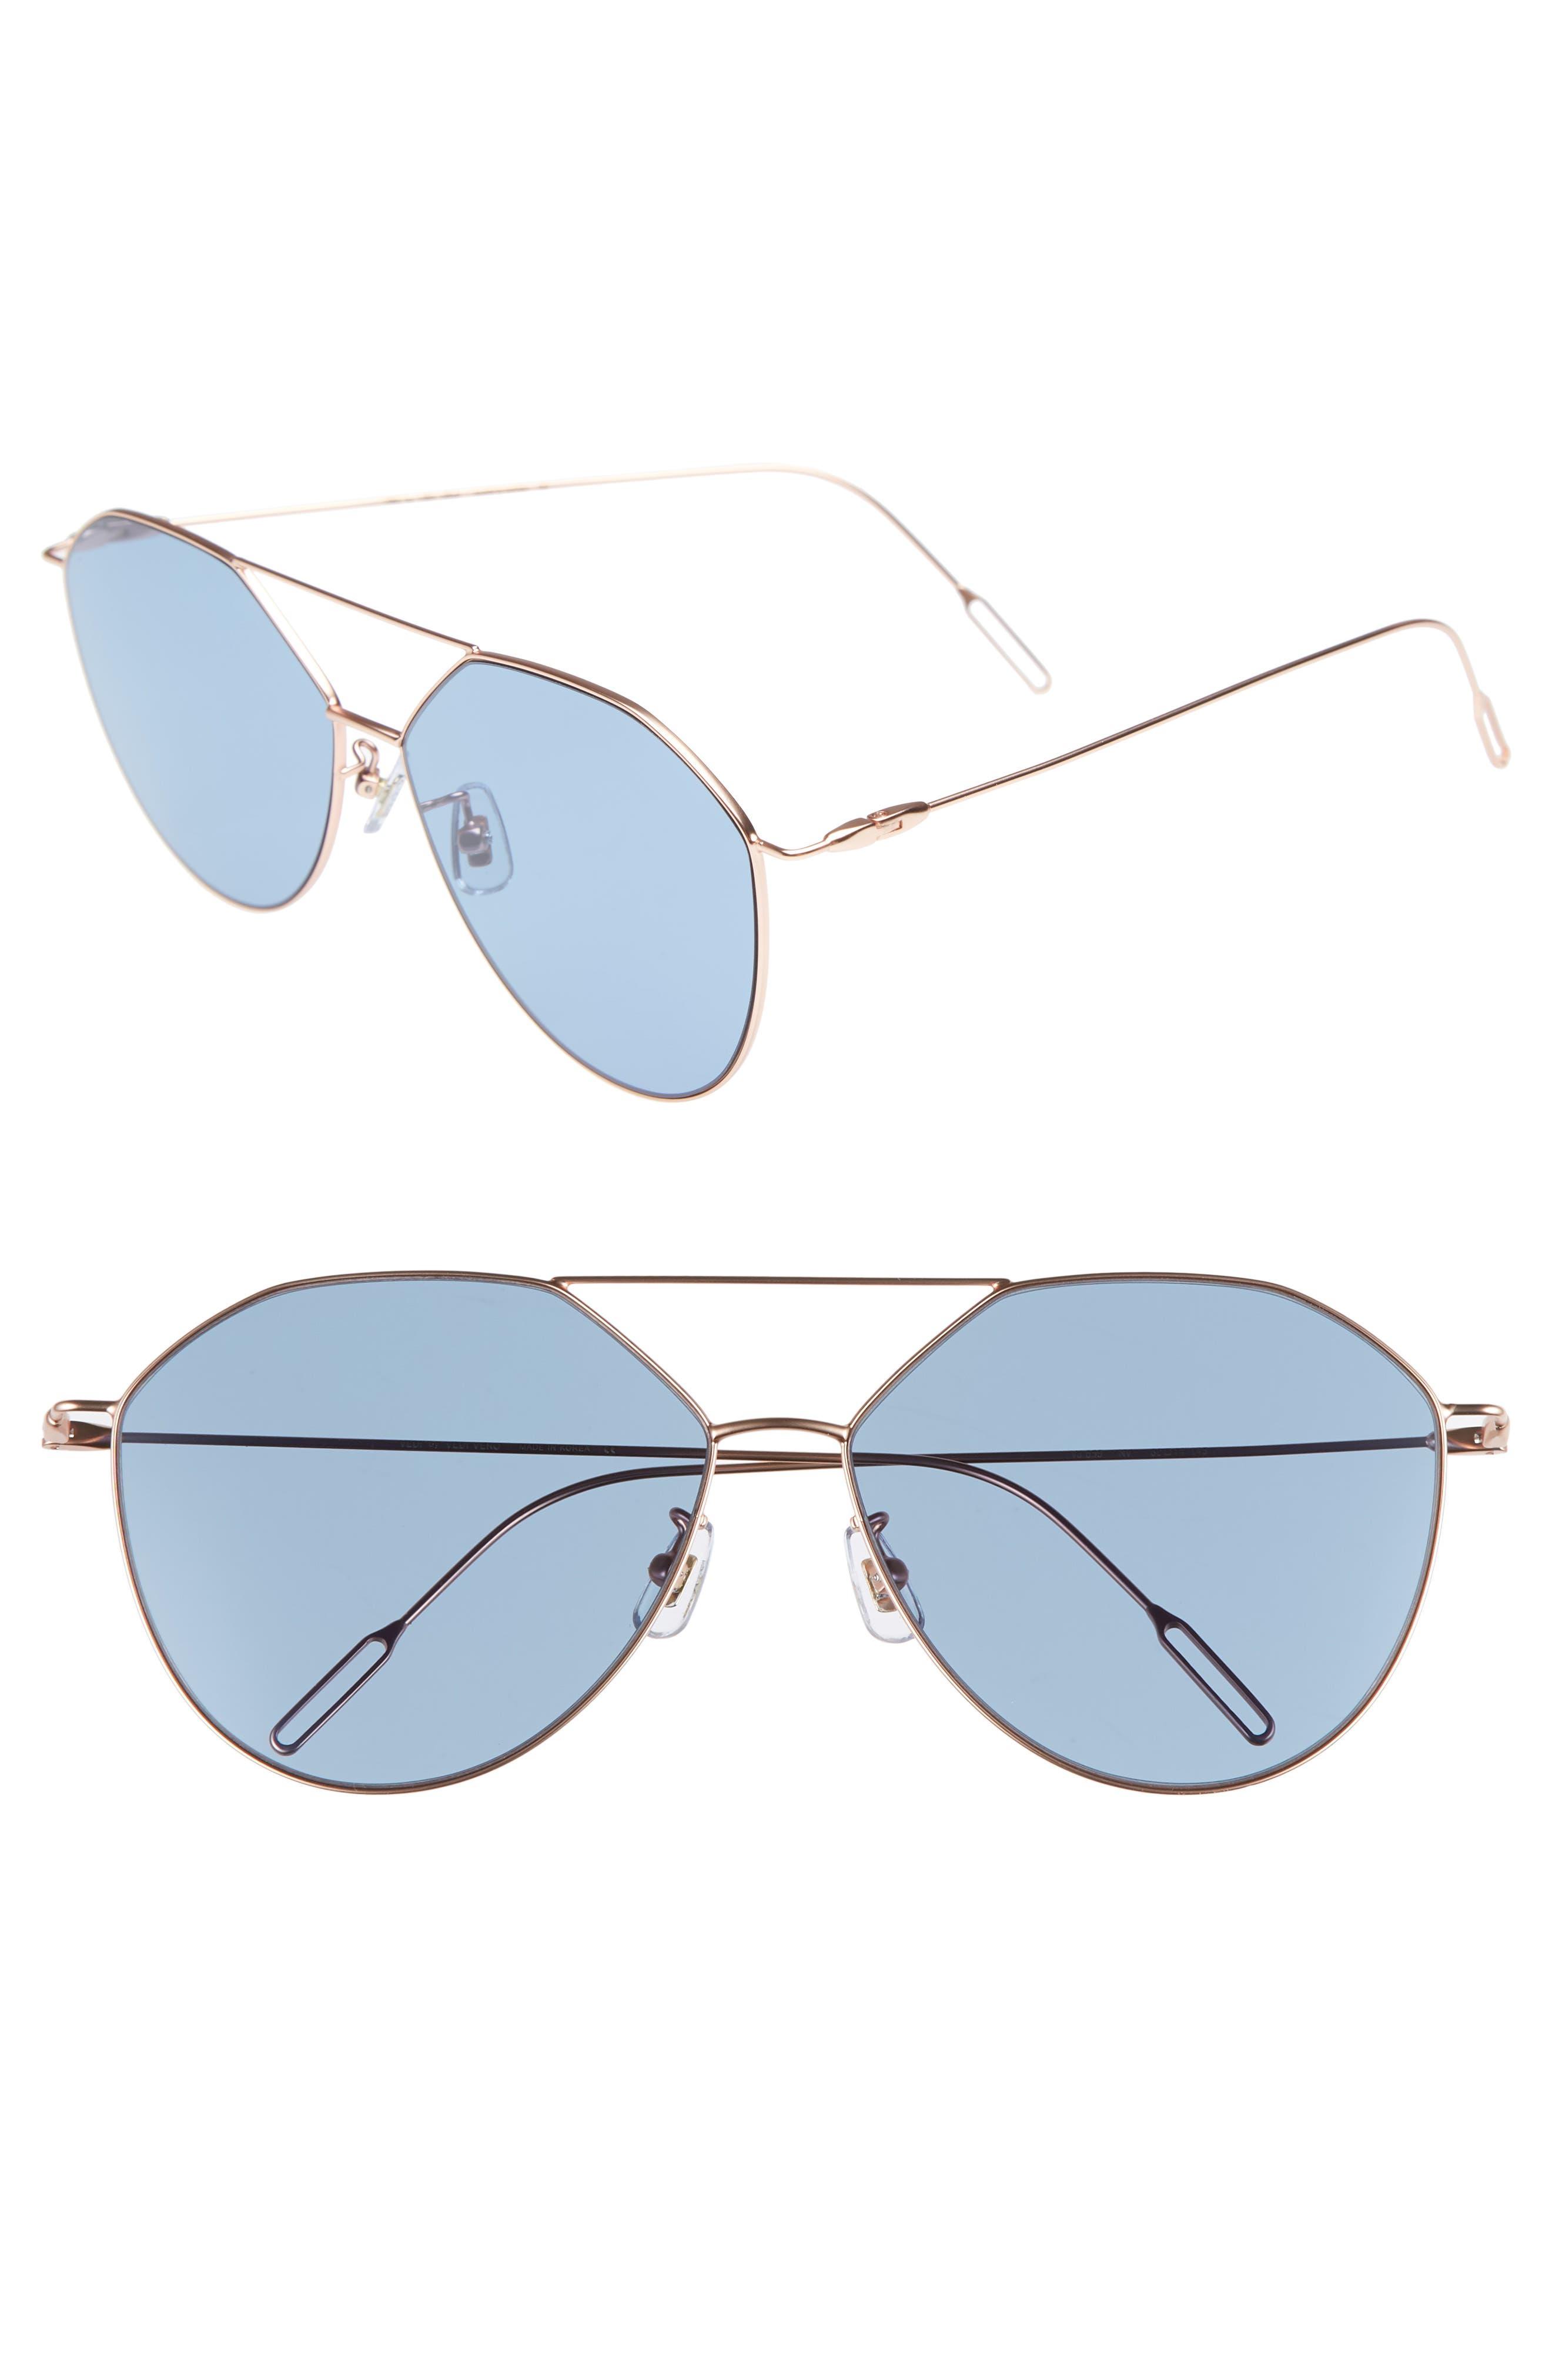 1f52252f77c5 Vedi Vero 62Mm Metal Oversize Aviator Sunglasses - Rose Gold/navy